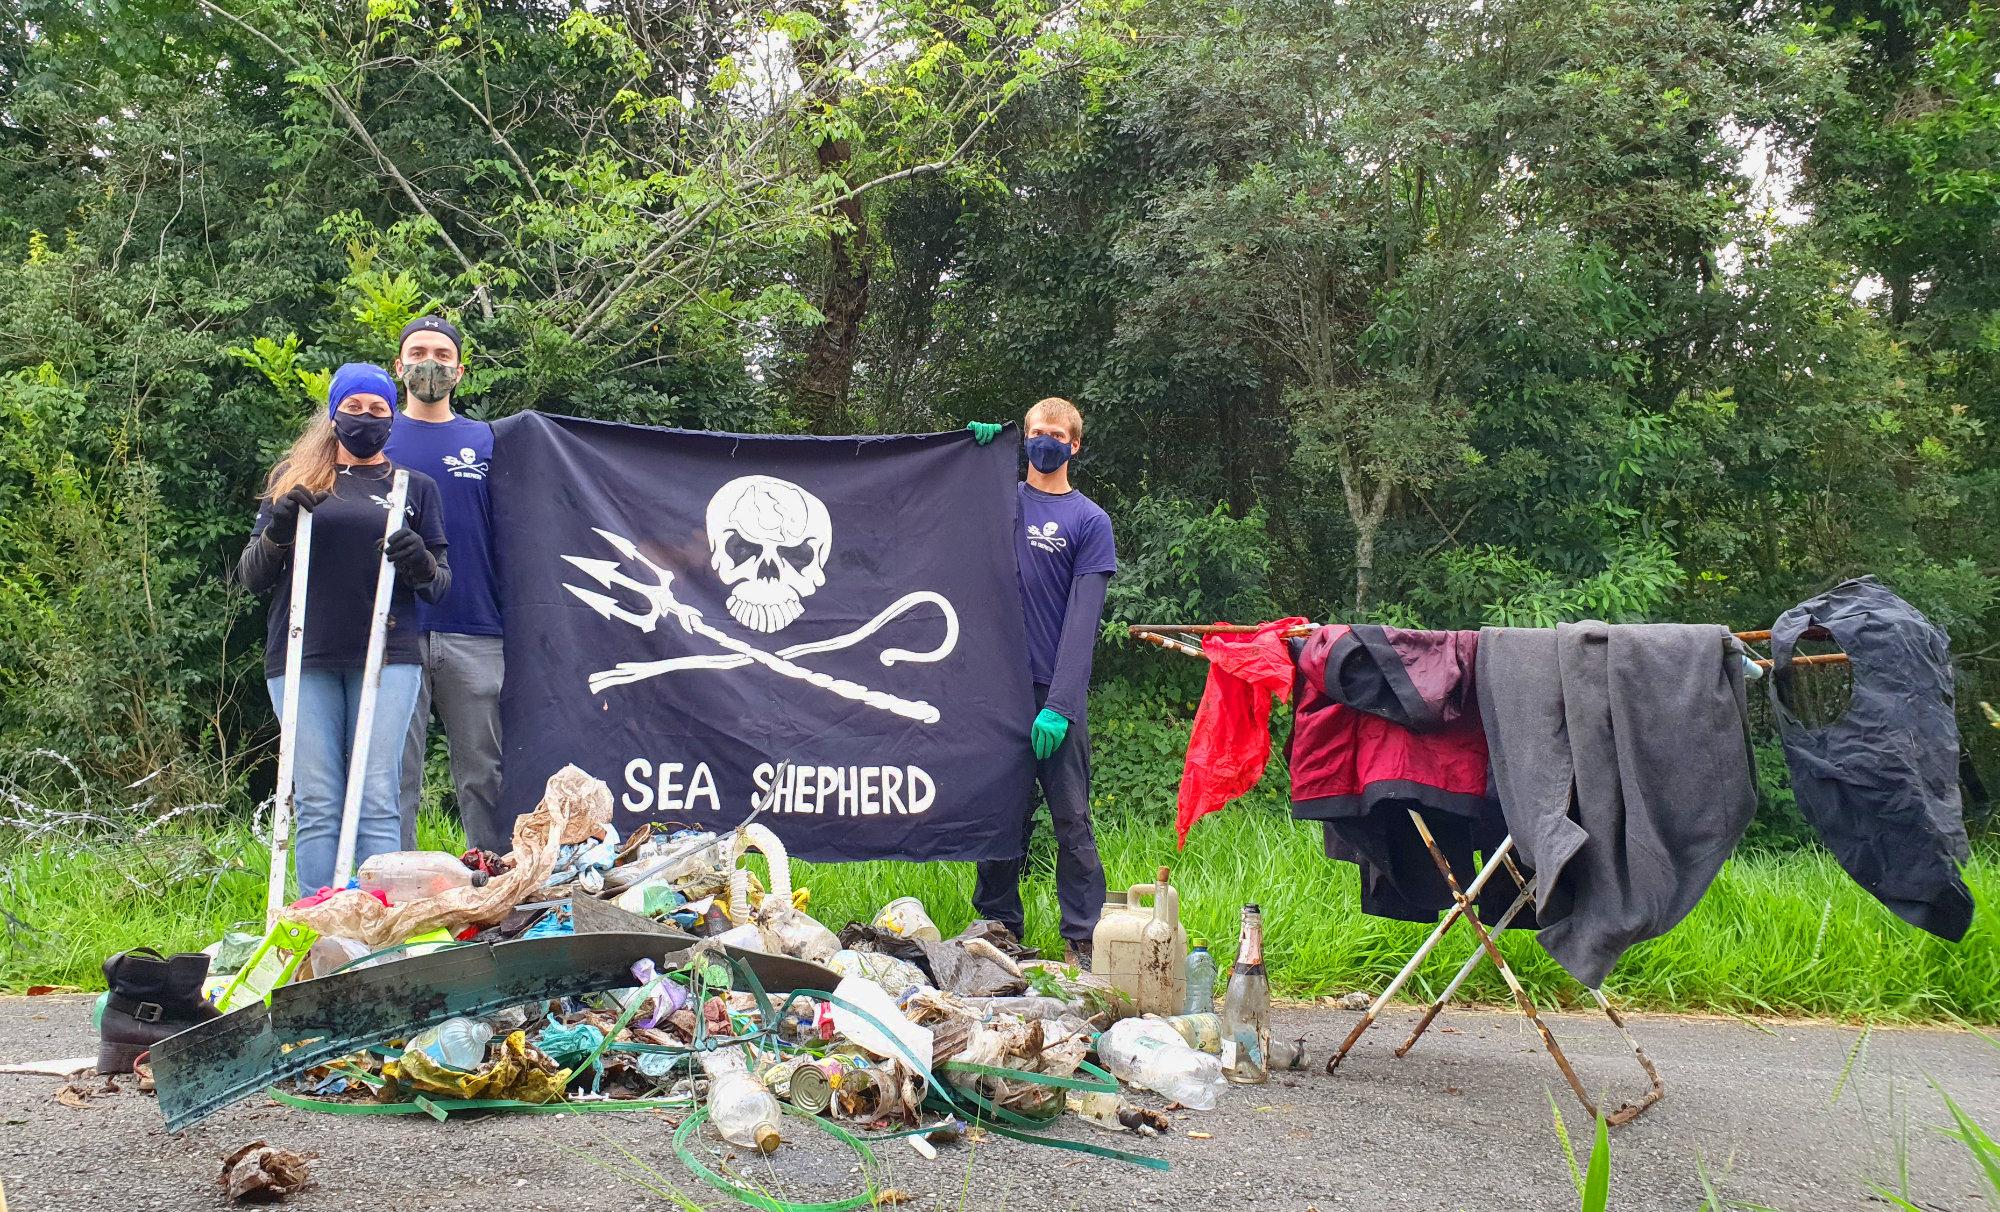 Voluntários na frente de pilha de lixo segurando bandeira da Sea Shepherd